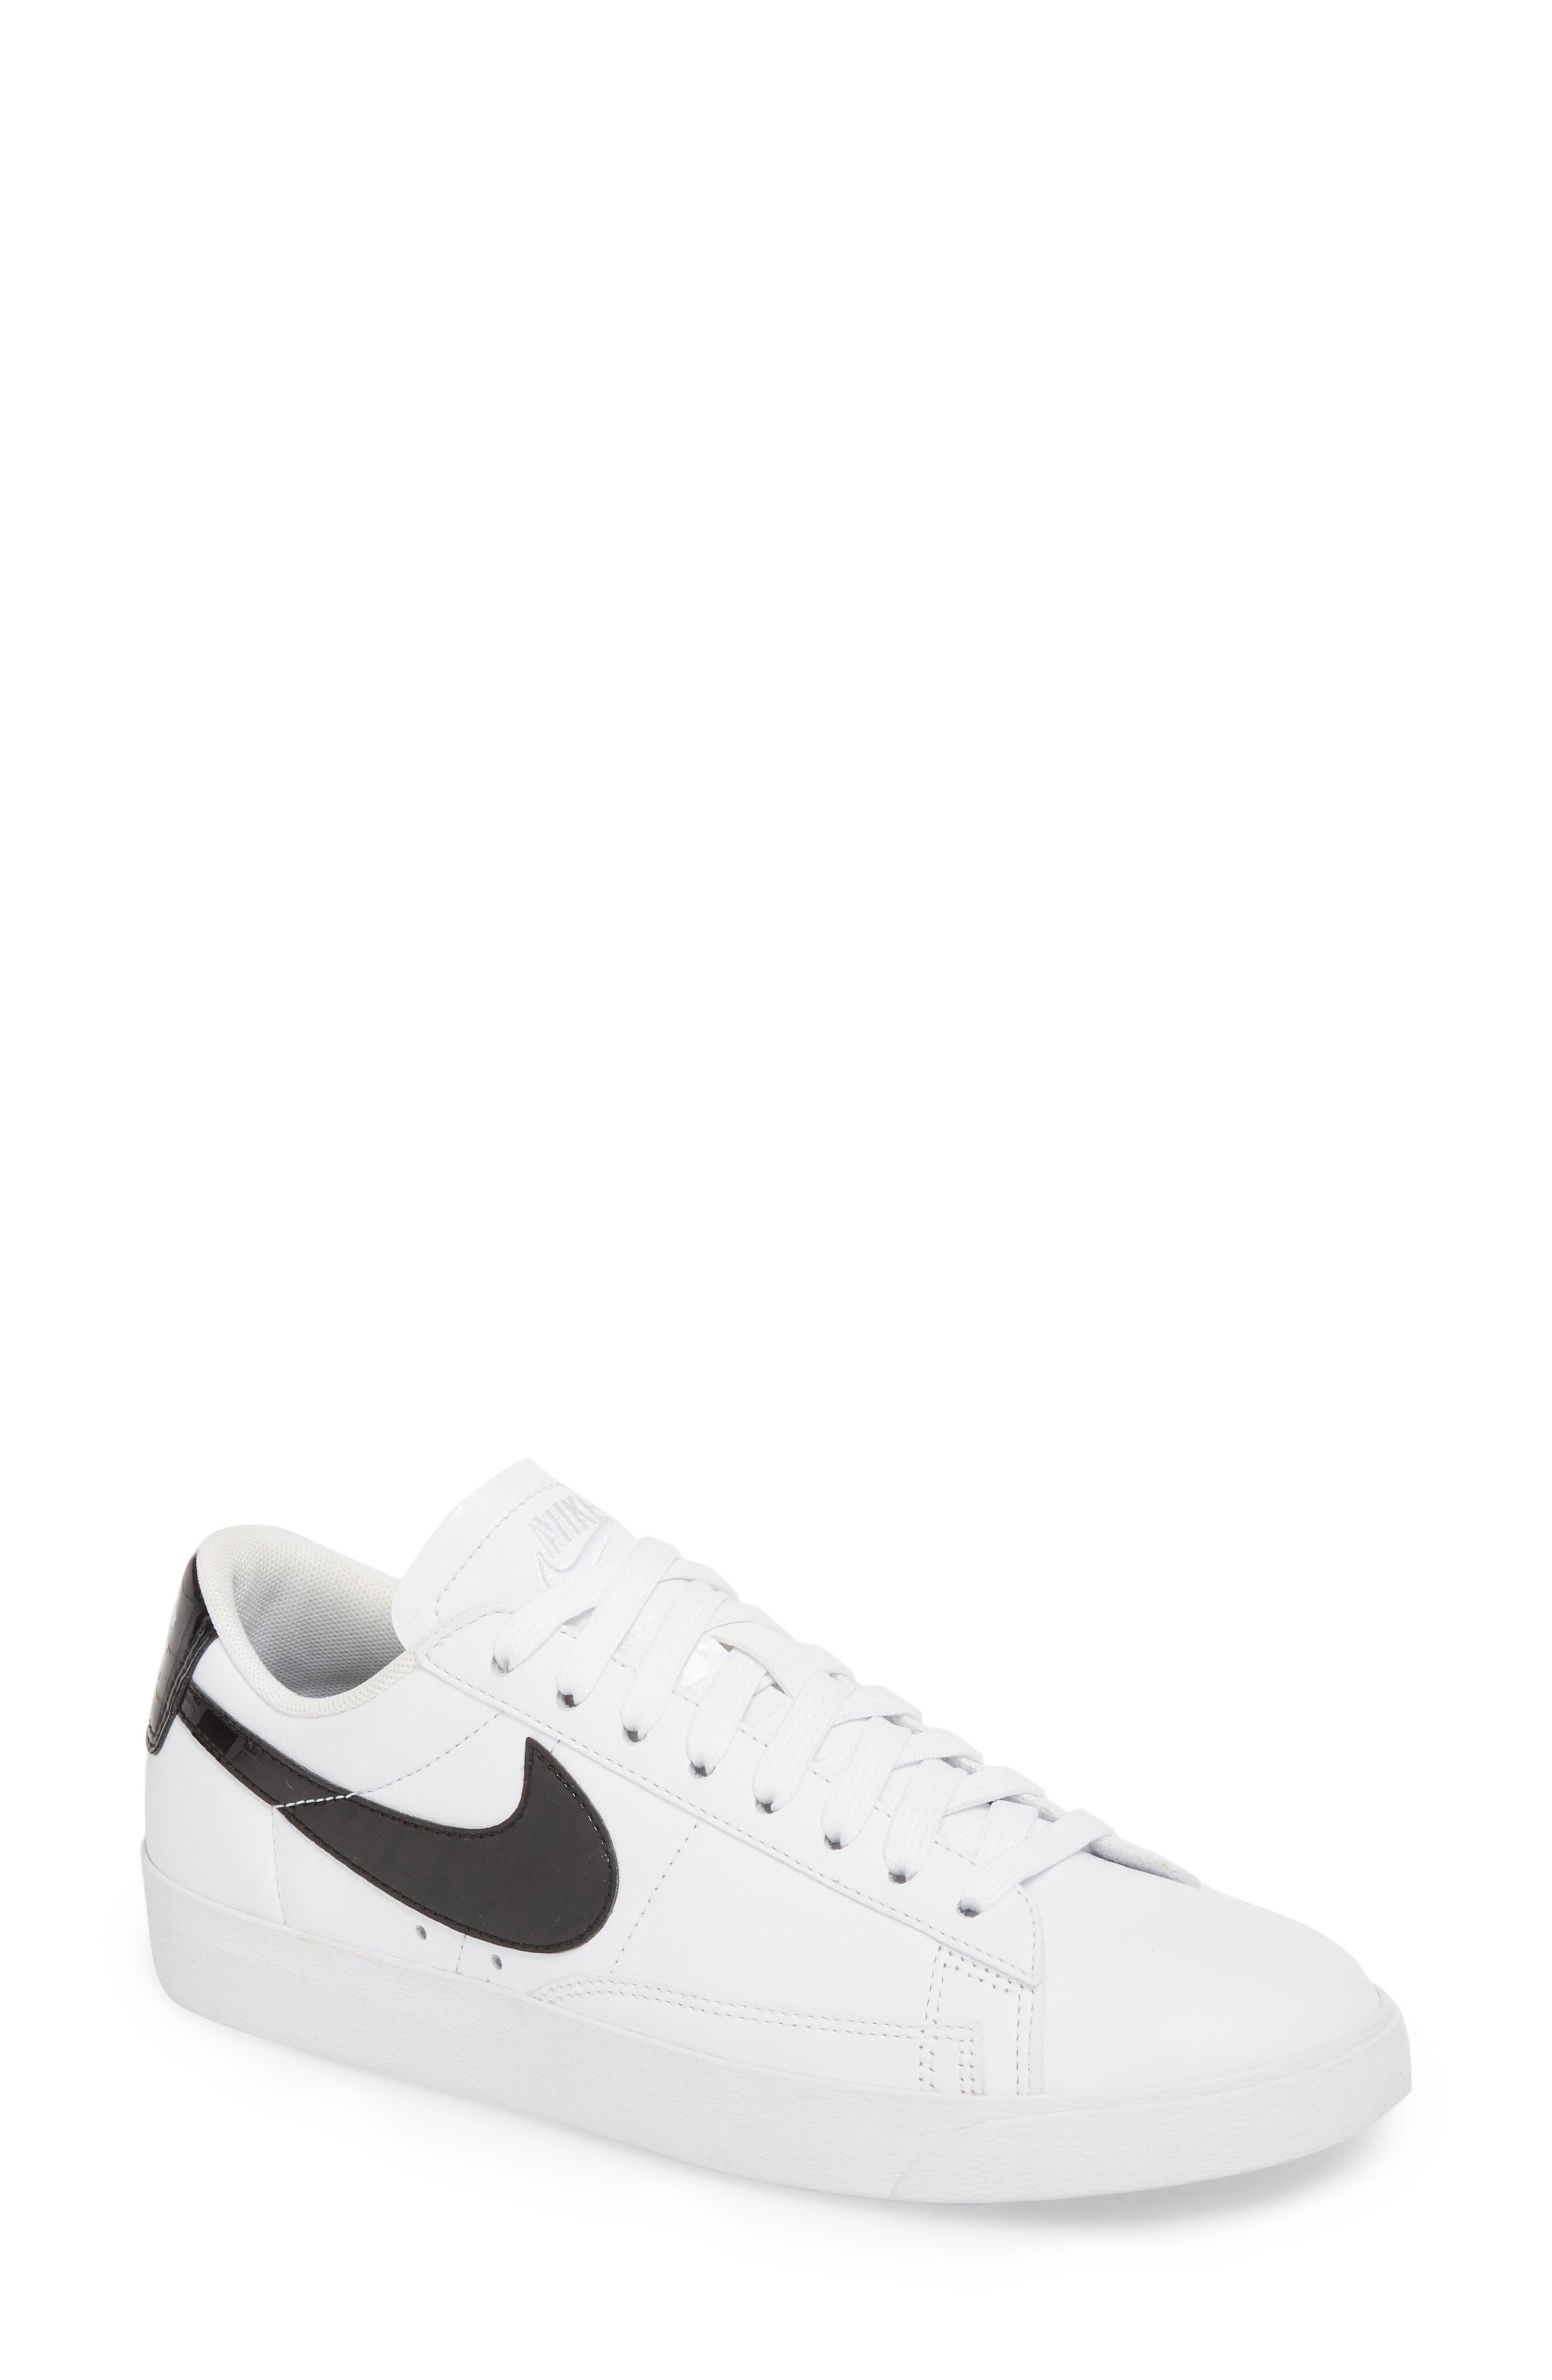 Blazer Low Essential Sneaker,                             Main thumbnail 1, color,                             100